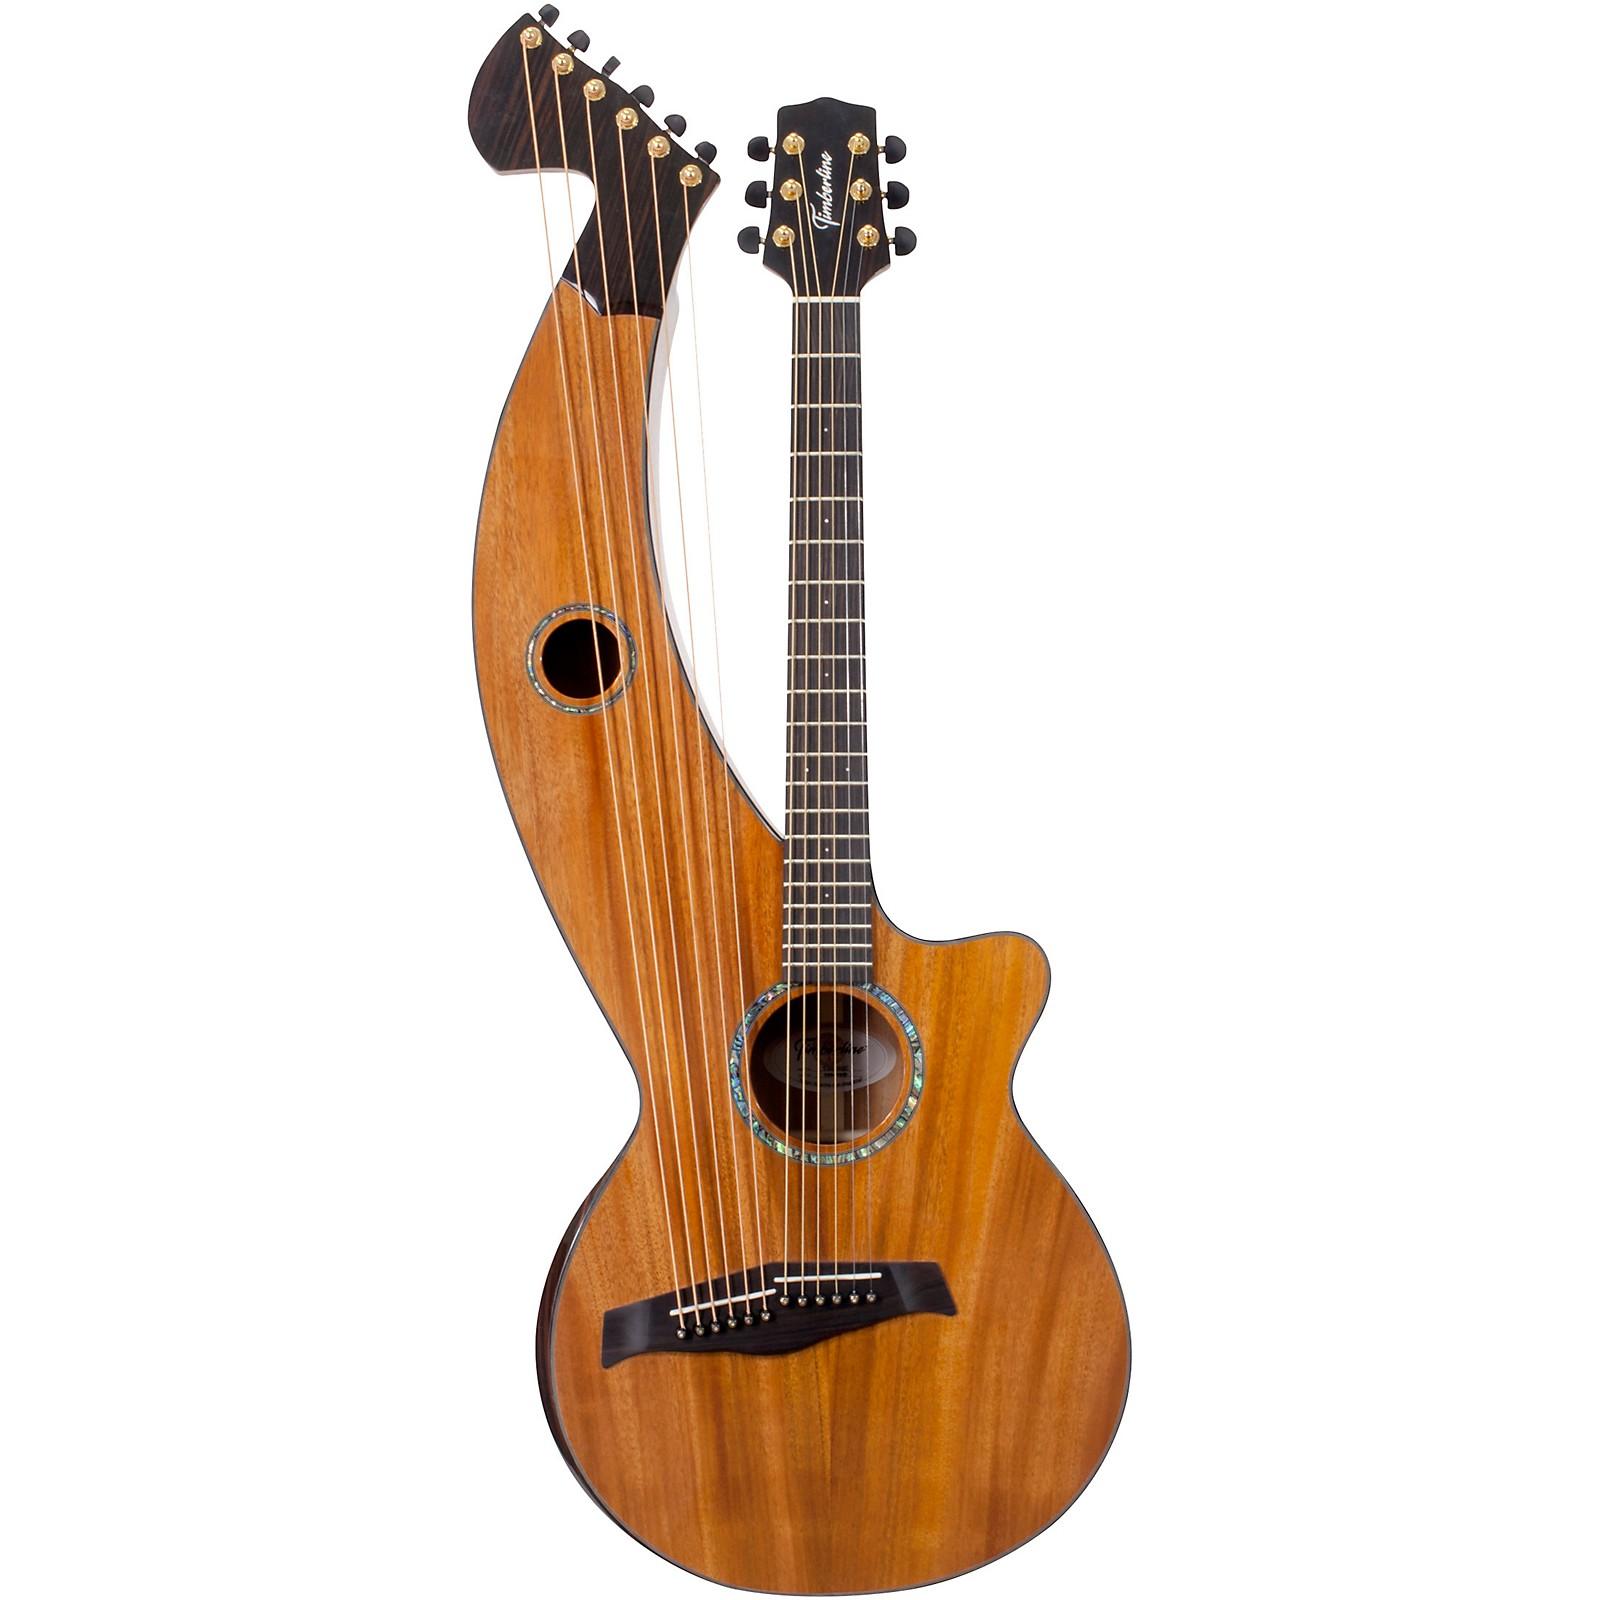 Timberline Guitars T30HGc Solid Tropical Mahogany 12-String Cutaway Acoustic-Electric Harp Guitar